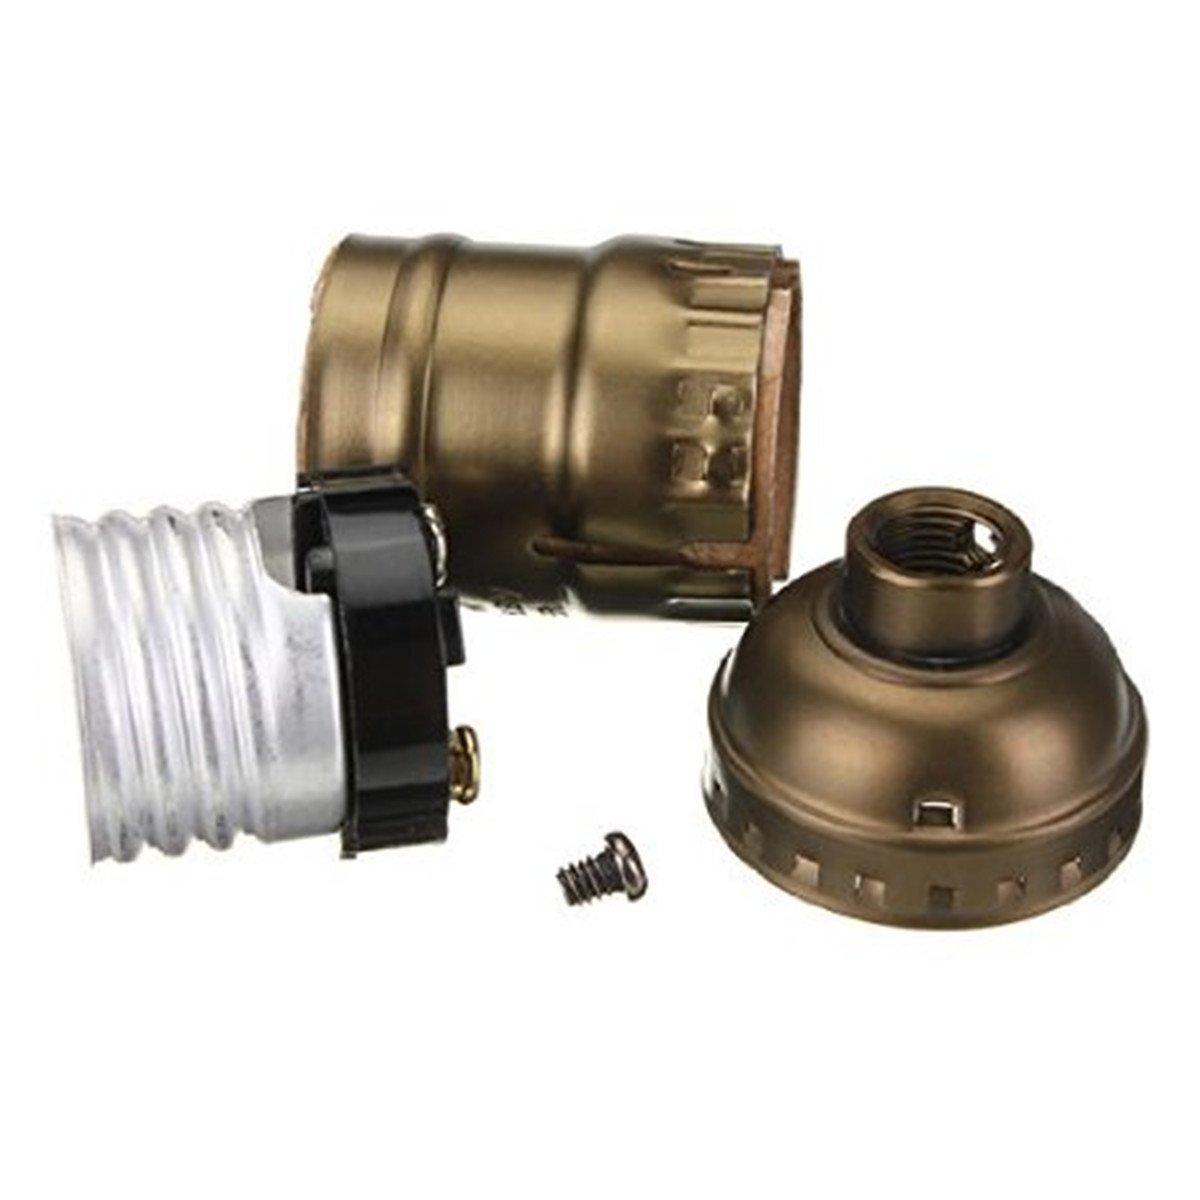 Sunny Edison Vintage Lamp Light Base Socket Holder Adapter